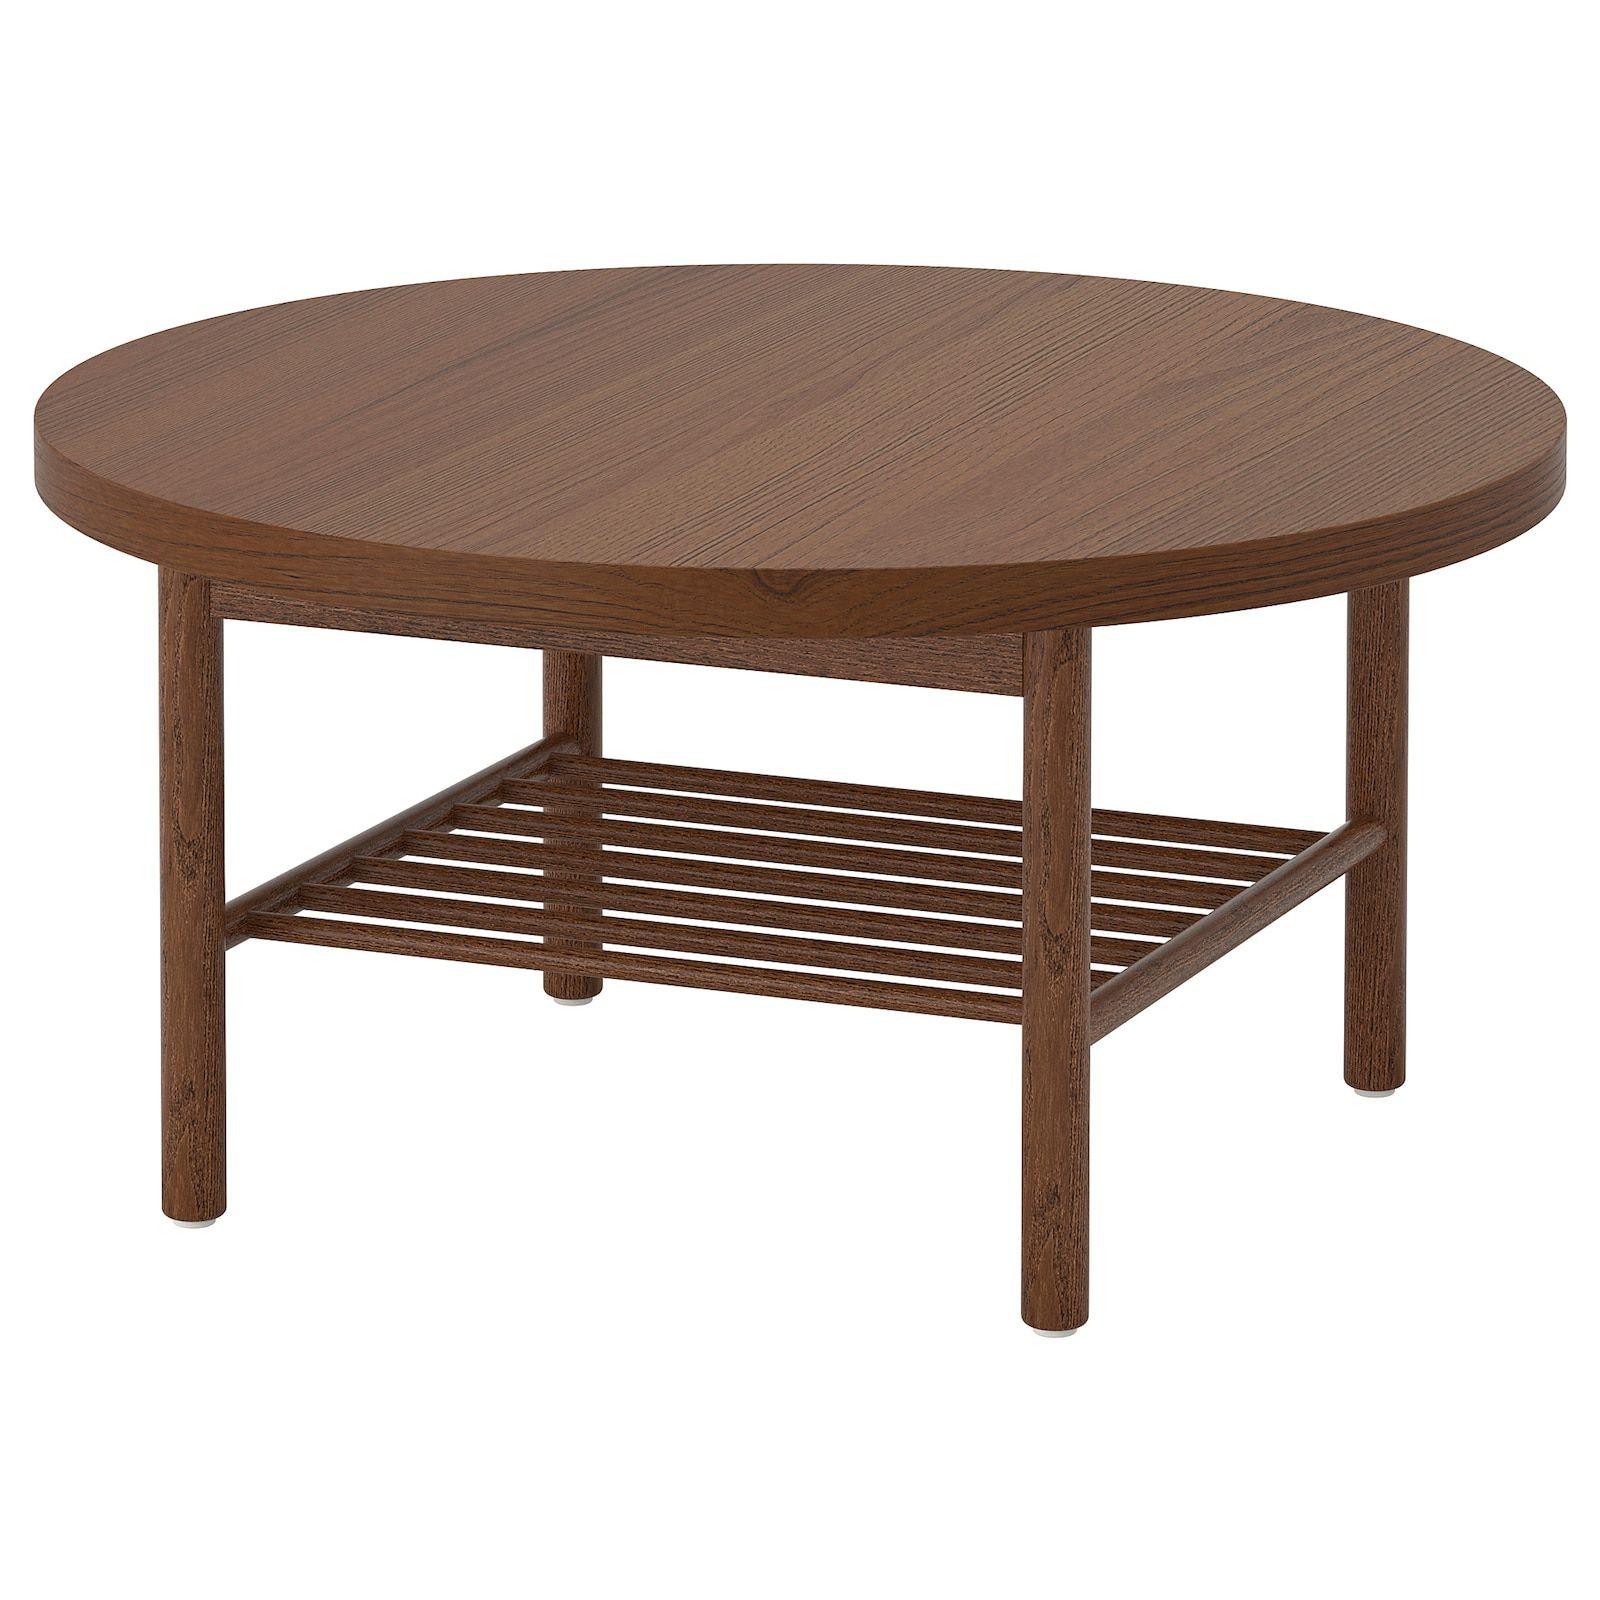 Https Www Ikea Com No No P Listerby Bord Brun 30351440 Ikea Kaffebord Stue Stil Stuebord [ 1600 x 1600 Pixel ]